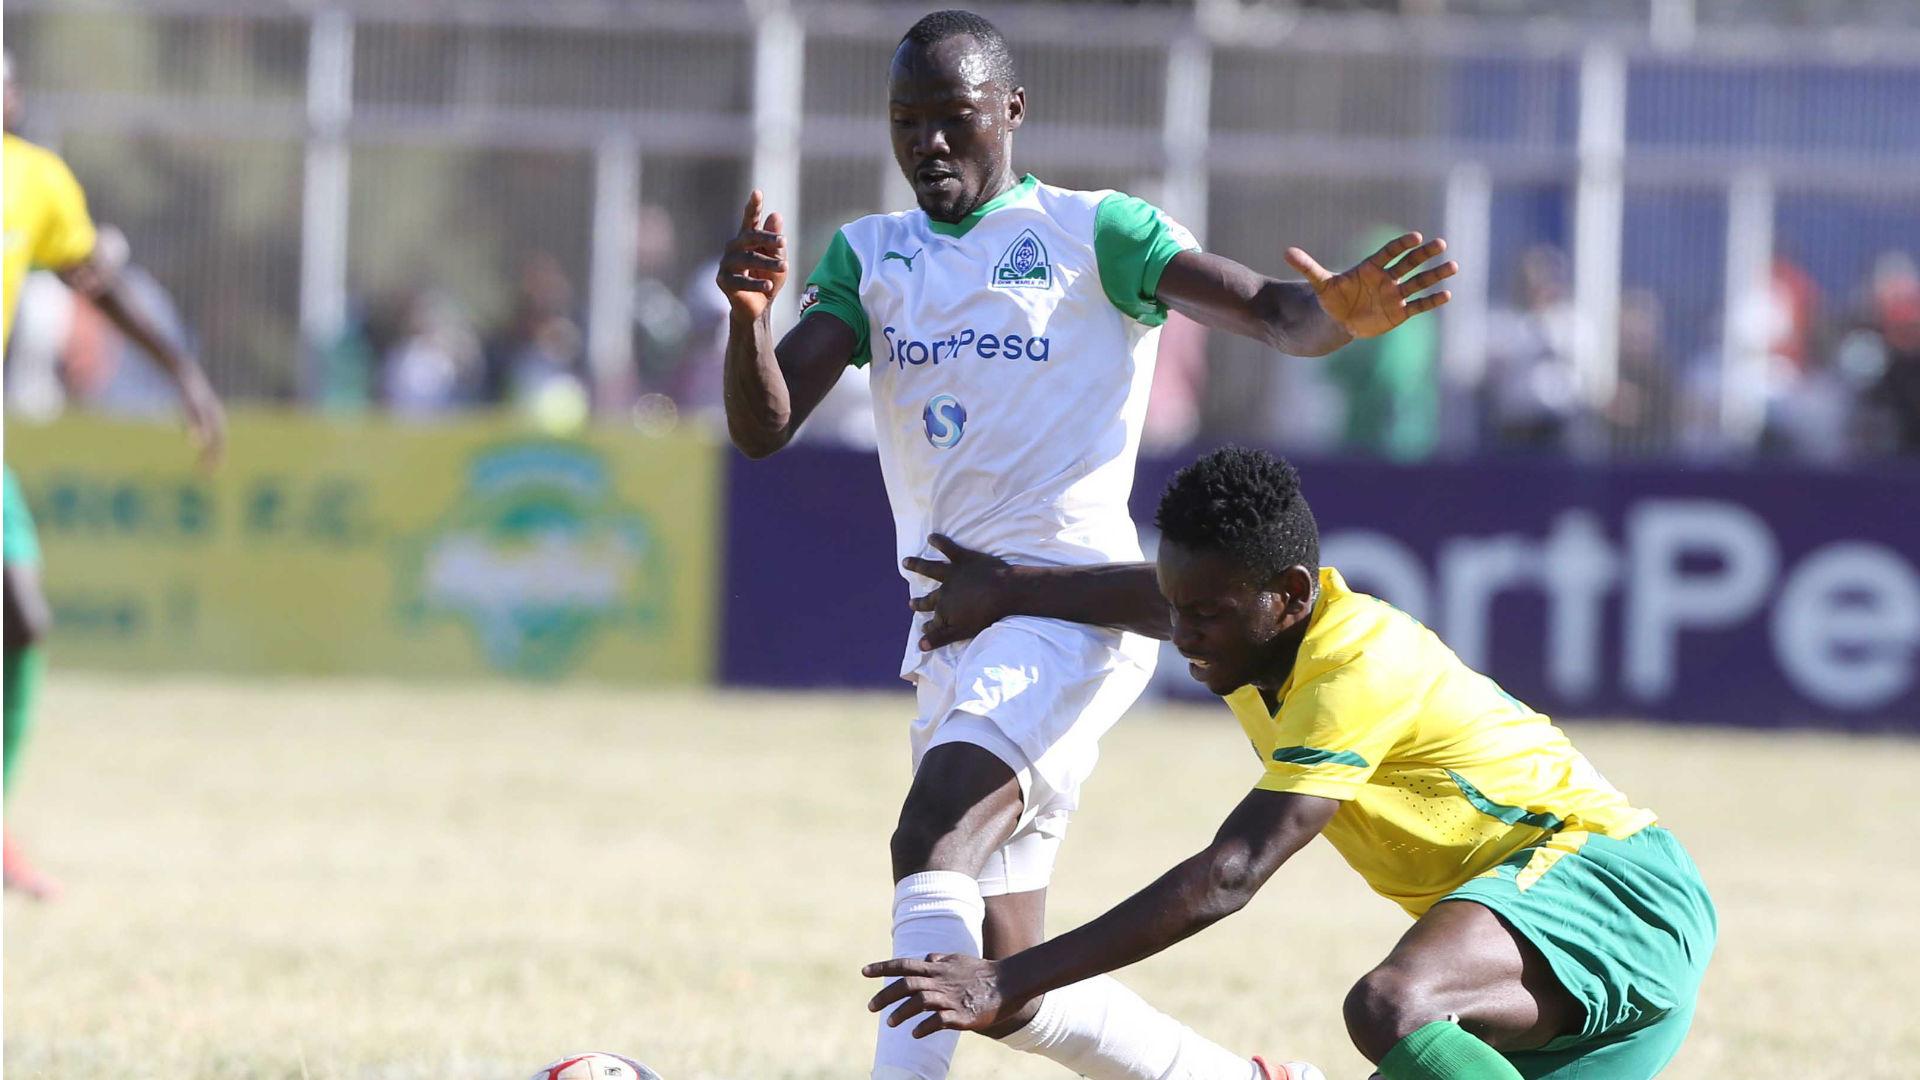 Godfrey Walusimbi in action against KSharks